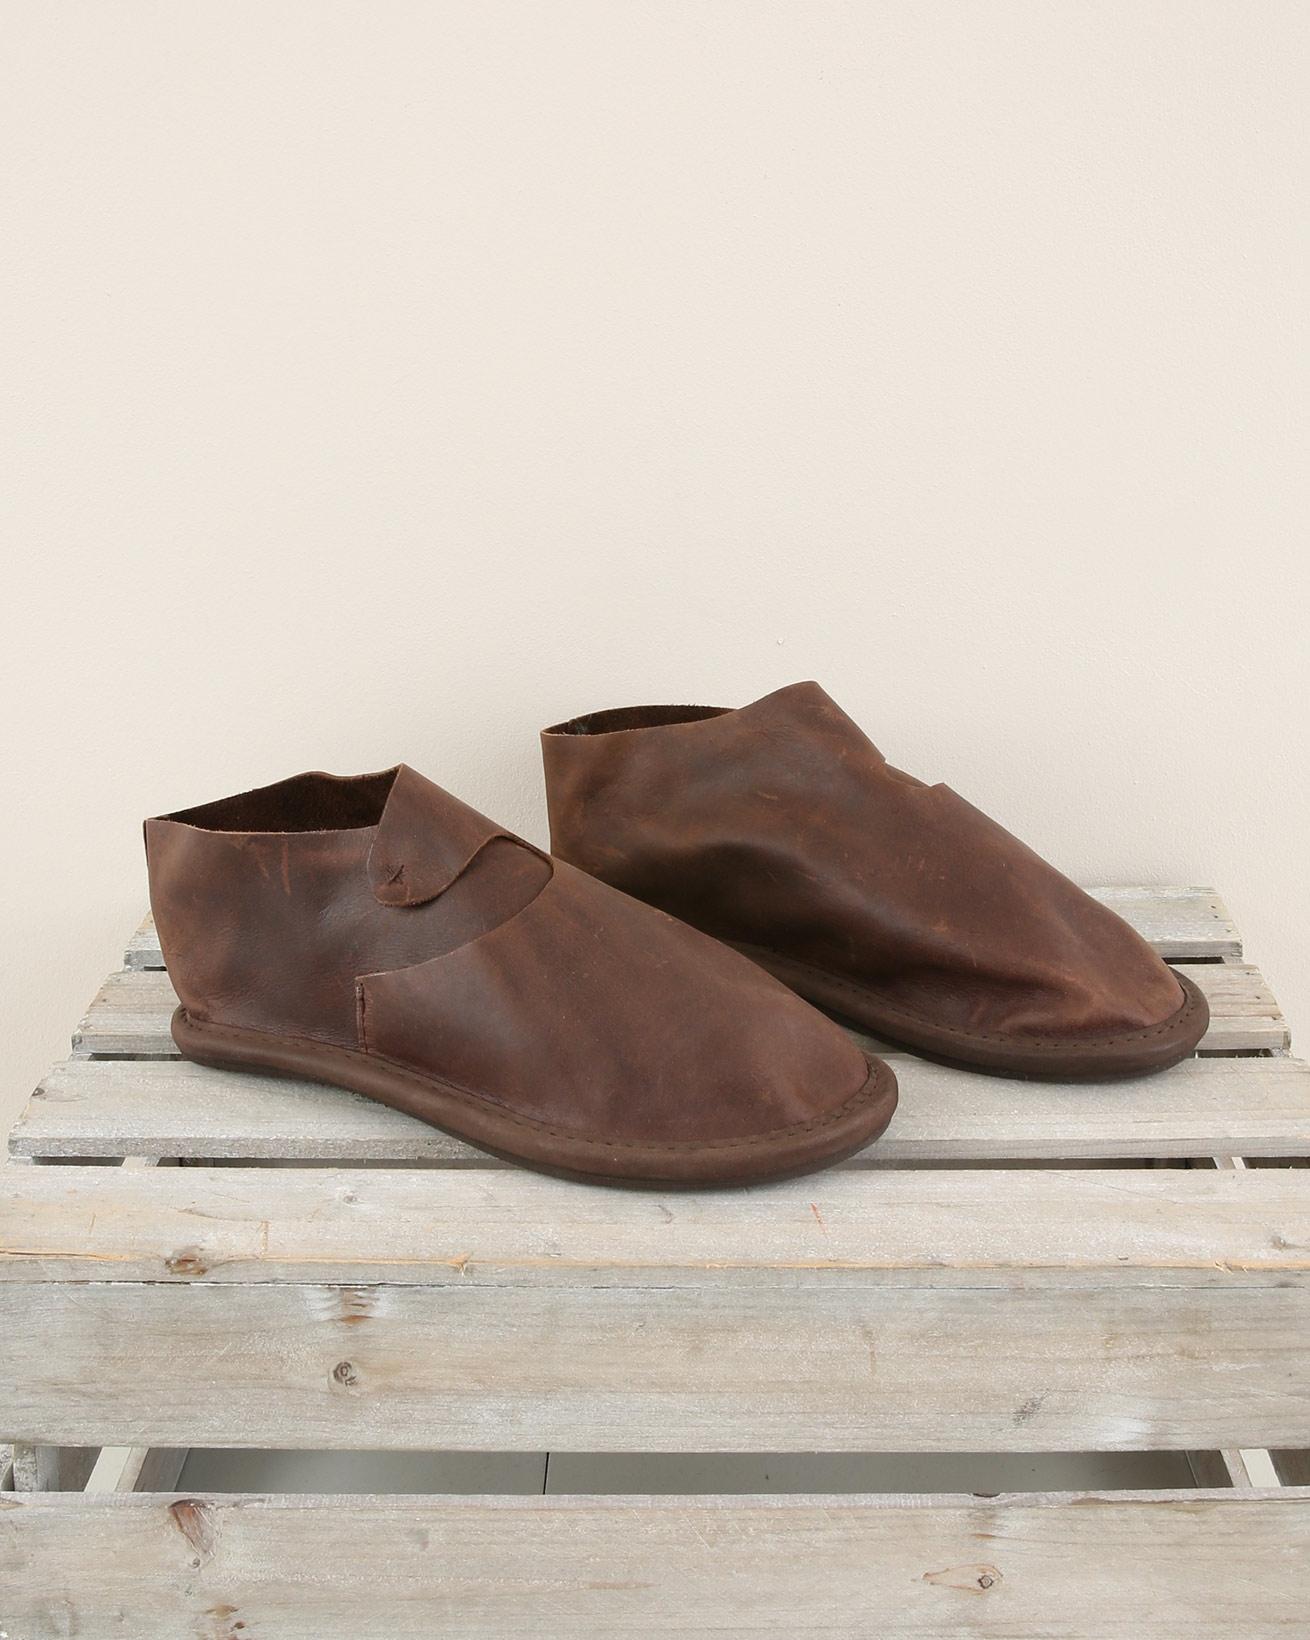 Viking Leather Slipper - Size 6 - Mocca - 1906